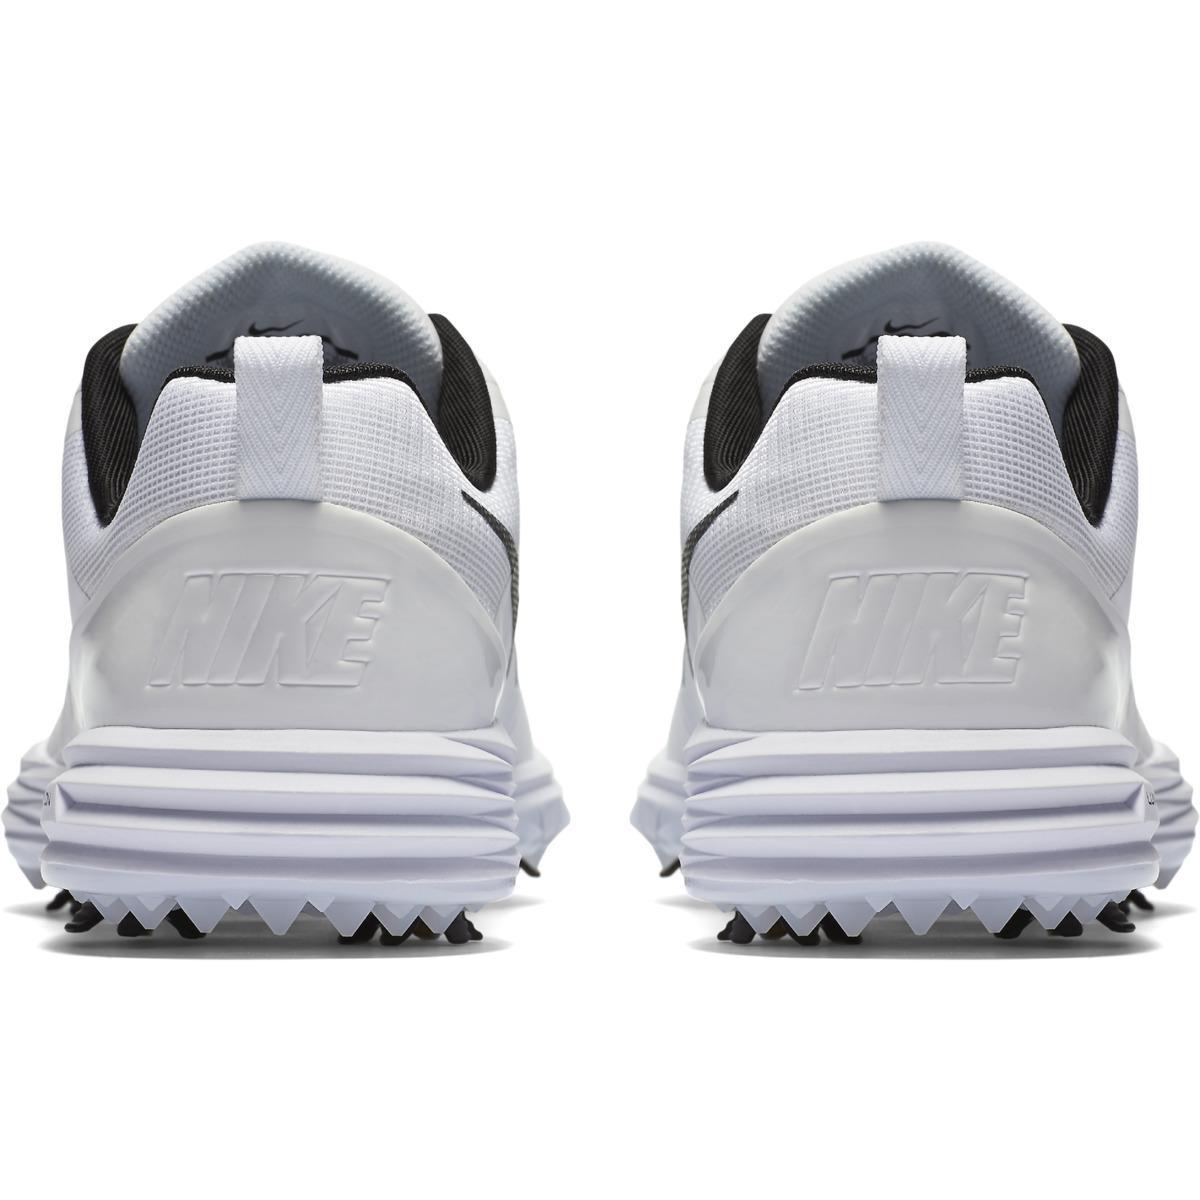 66377ba54772 Nike - White Lunar Command 2 Boa Golf Shoes for Men - Lyst. View fullscreen